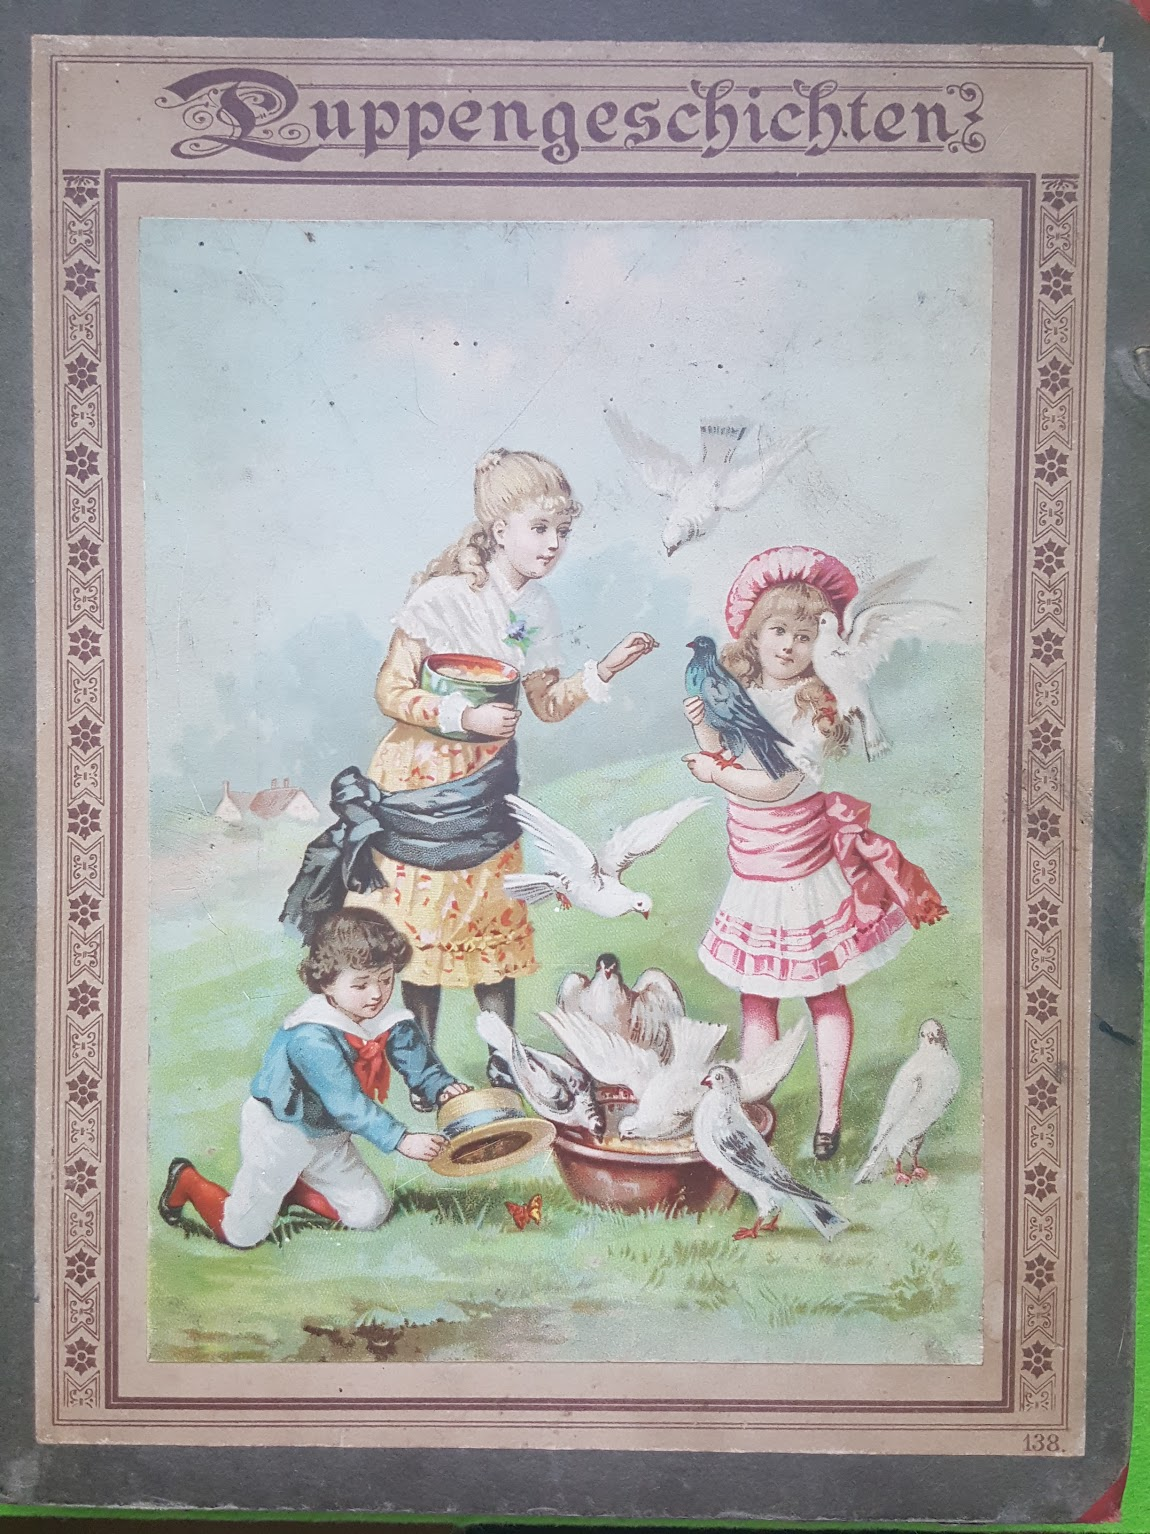 Emmy Friedberg - Puppengeschichten - 1888